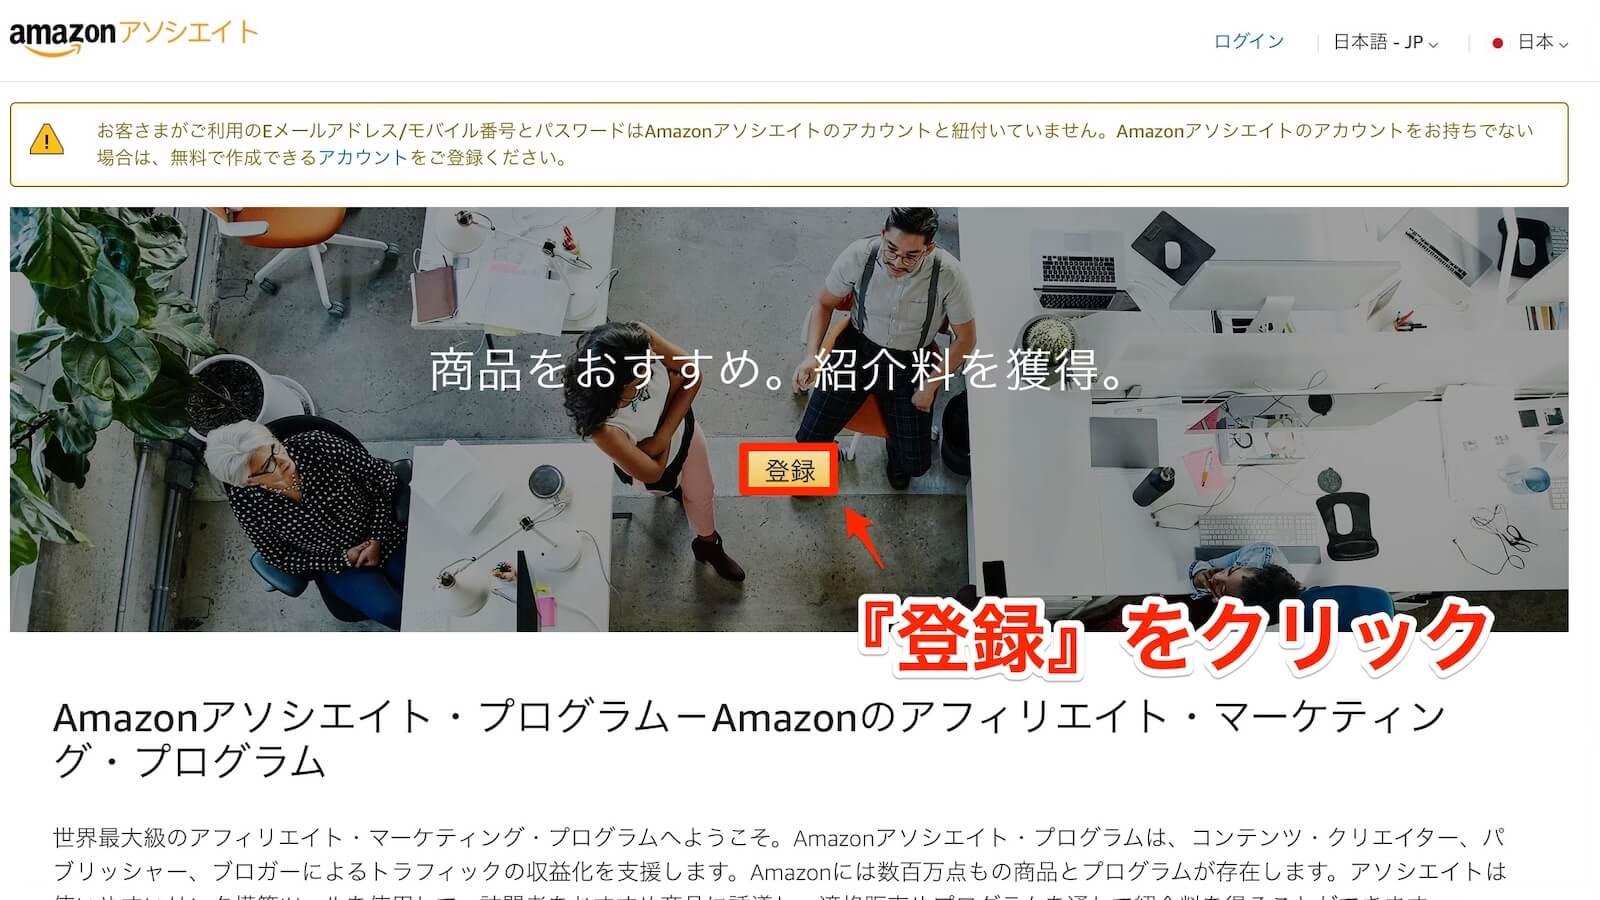 Amazon Associate Registration Screen Capture